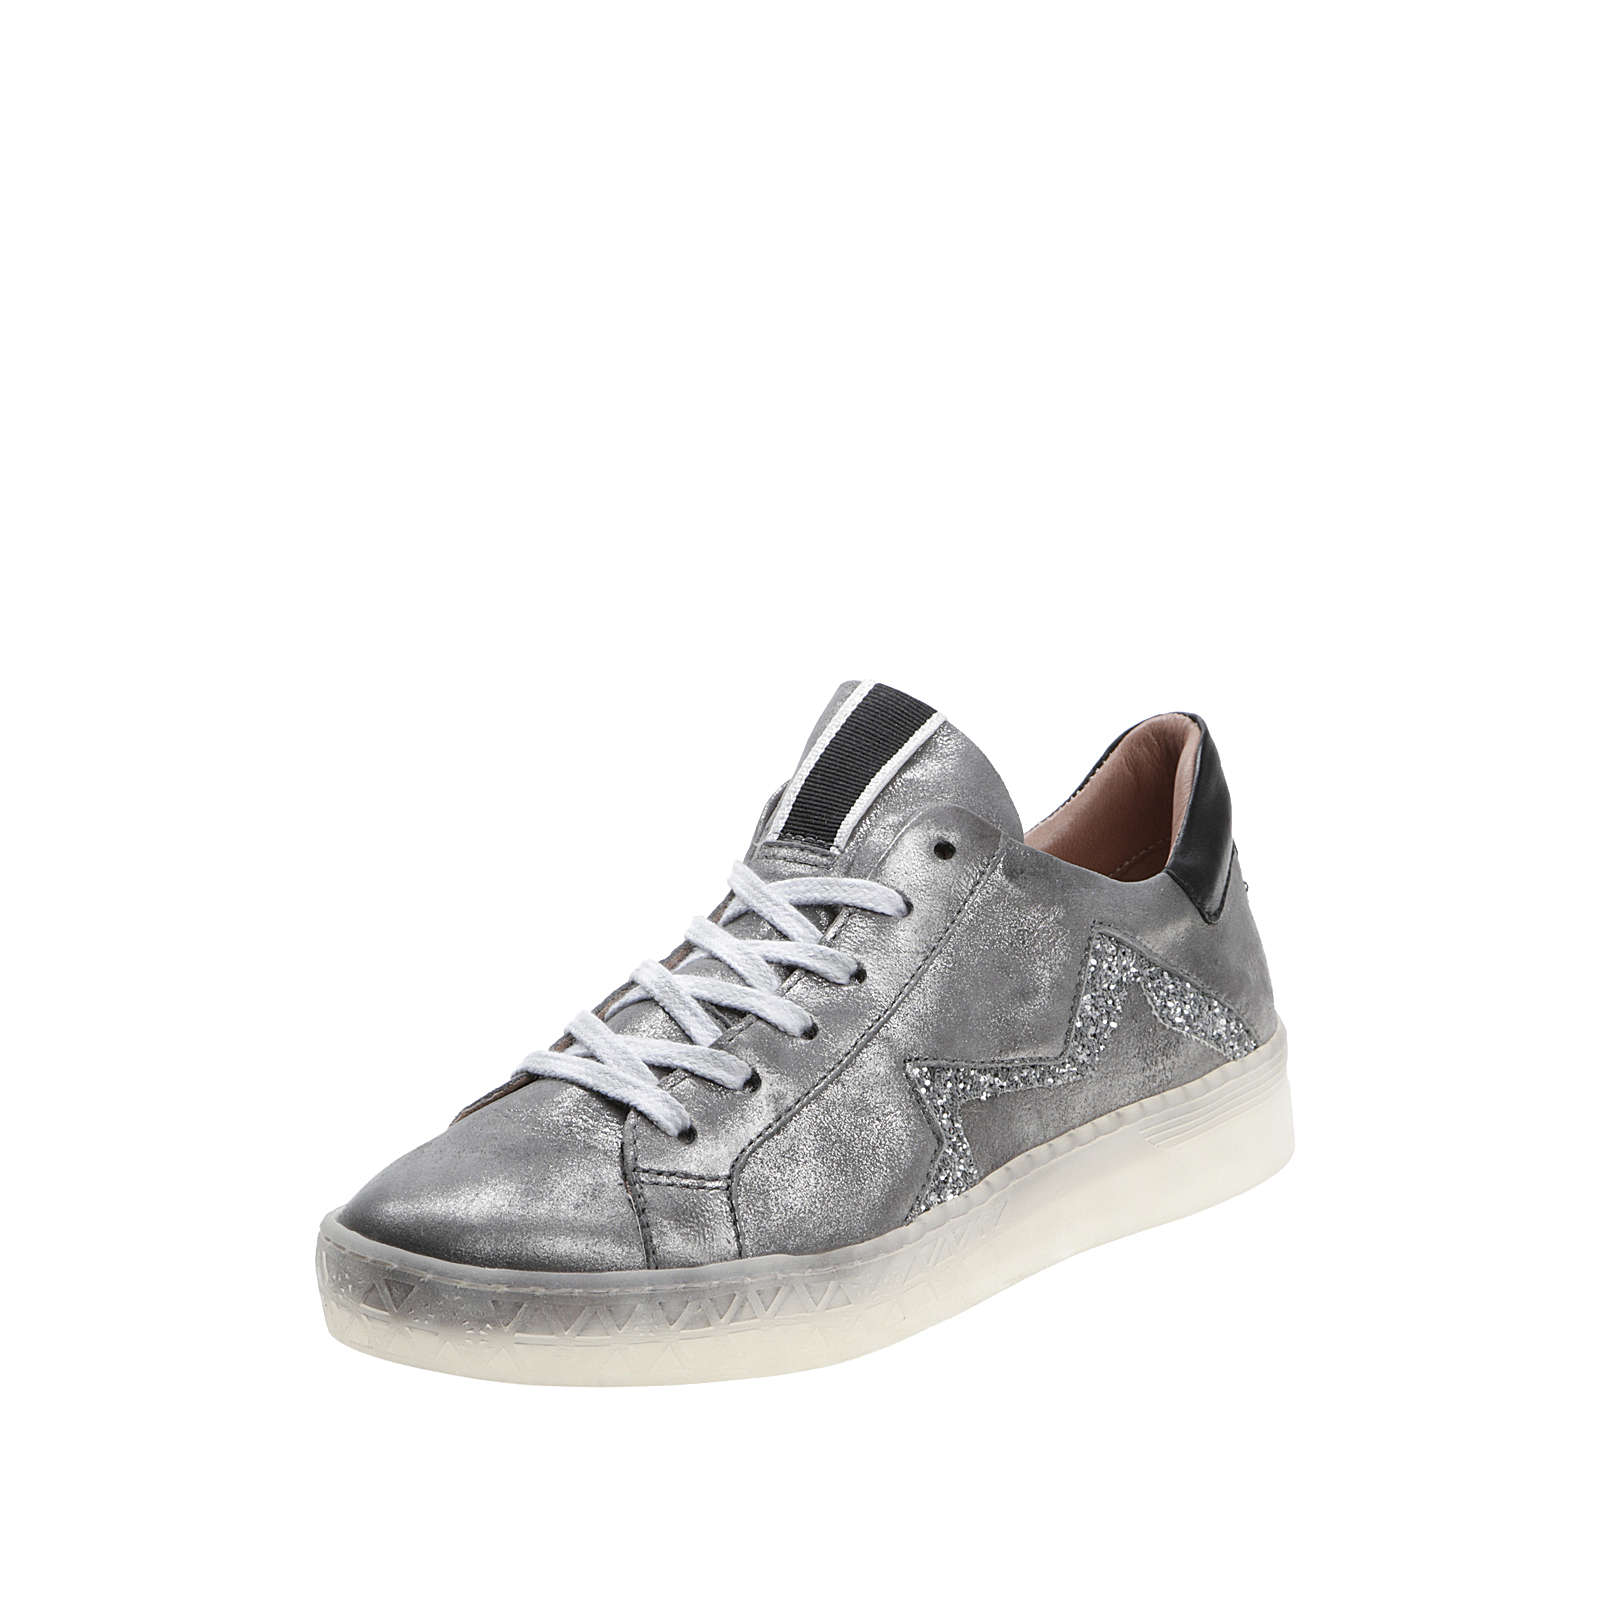 MJUS Sneaker Sneakers Low grau Damen Gr. 36